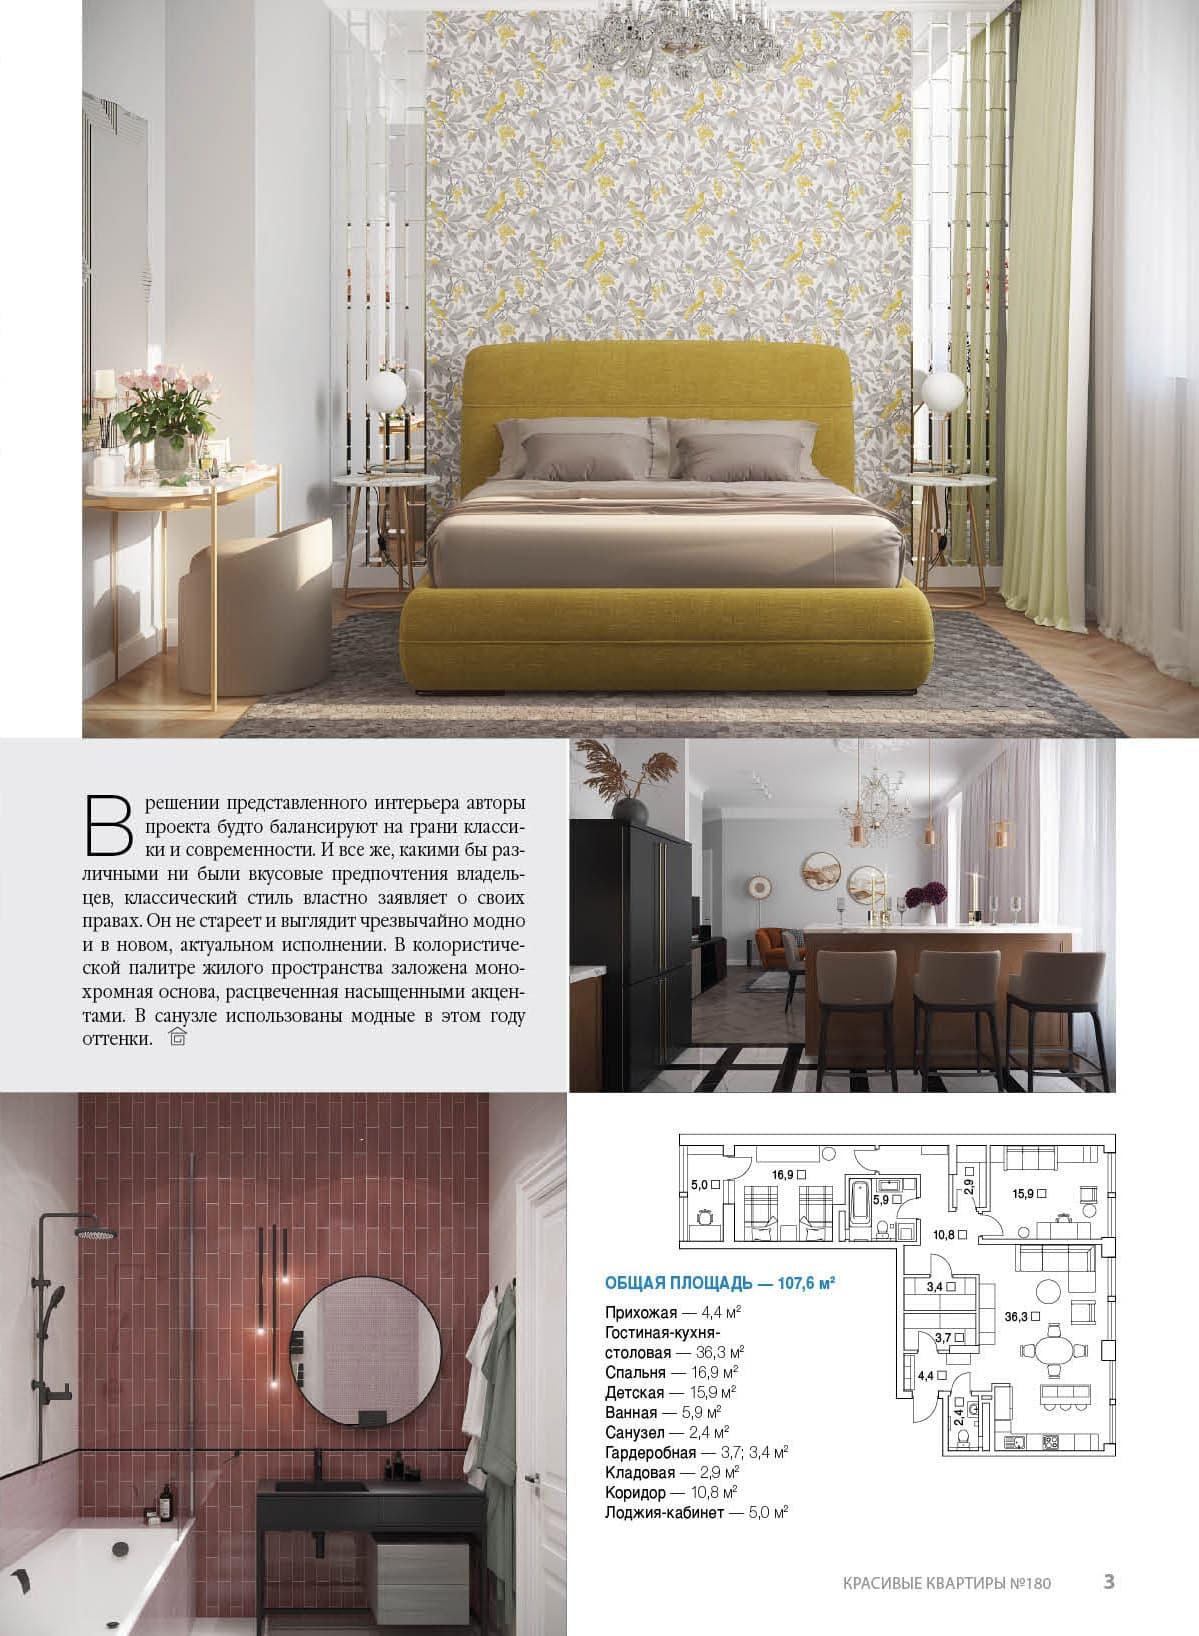 Журнал «Красивые квартиры» № 180